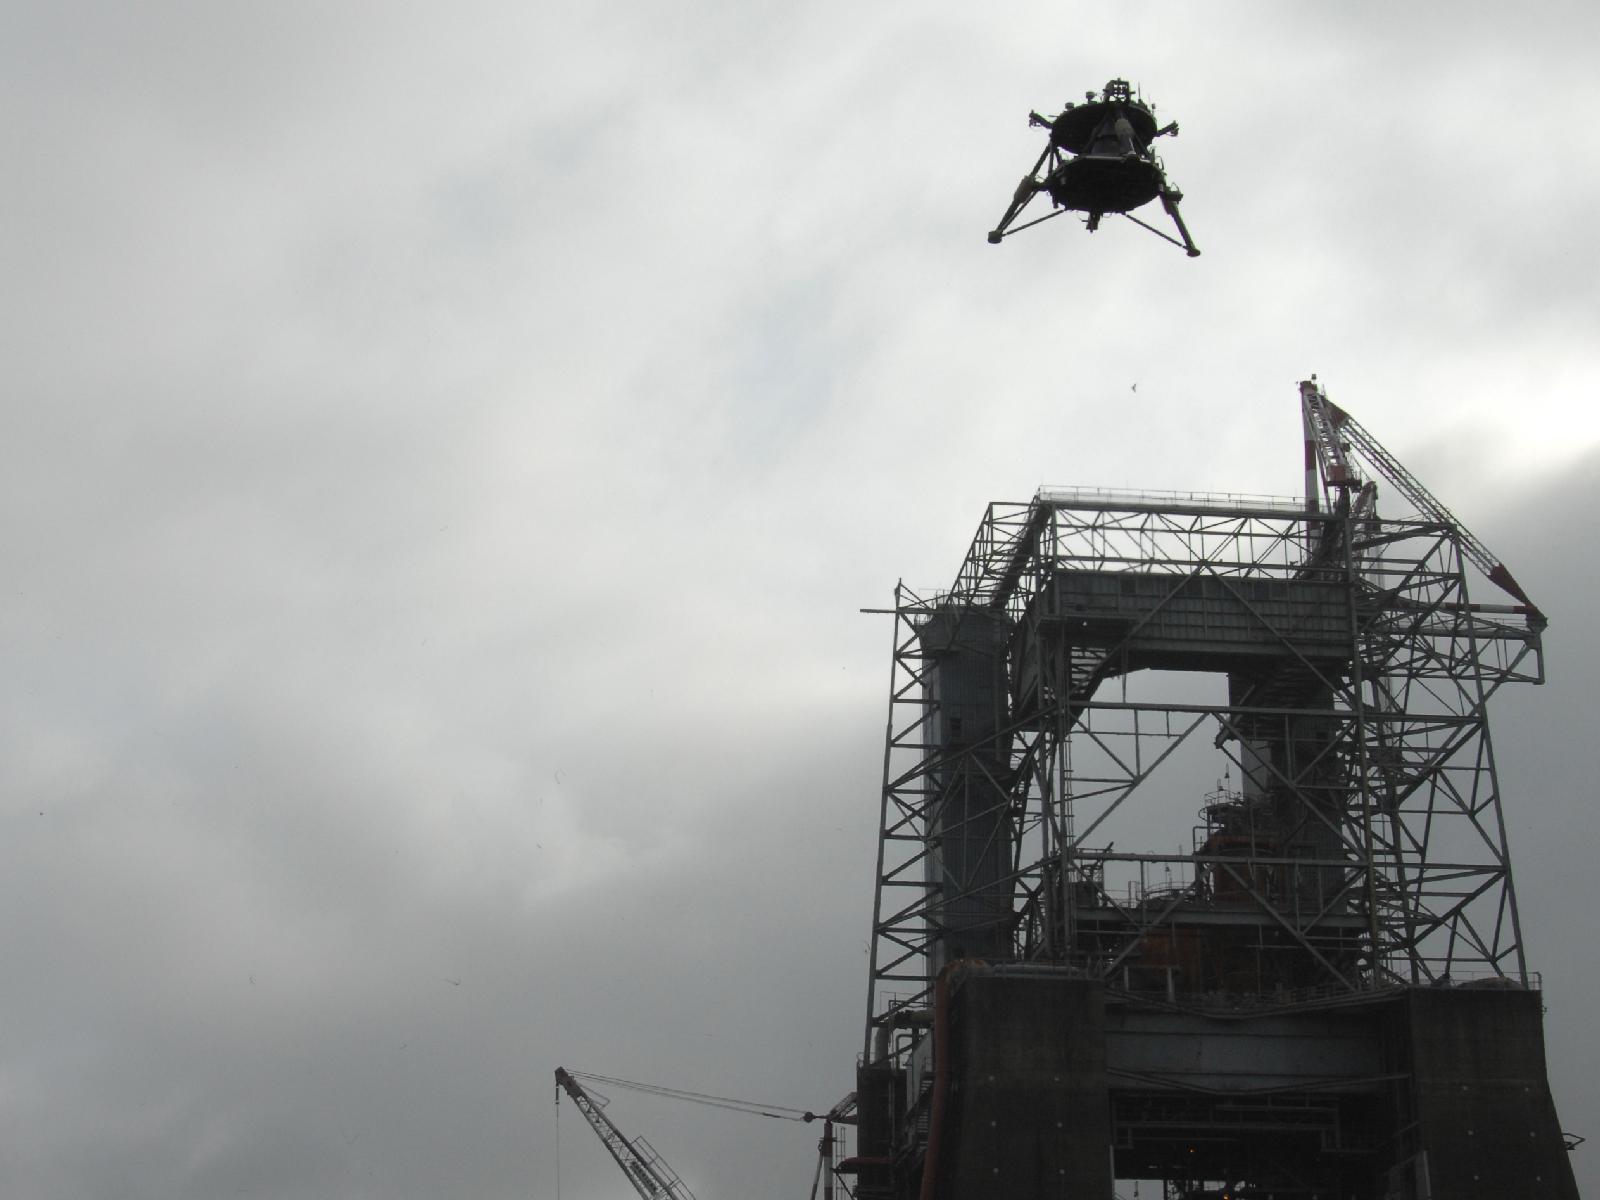 Mighty Eagle Lander Soars 100 Feet